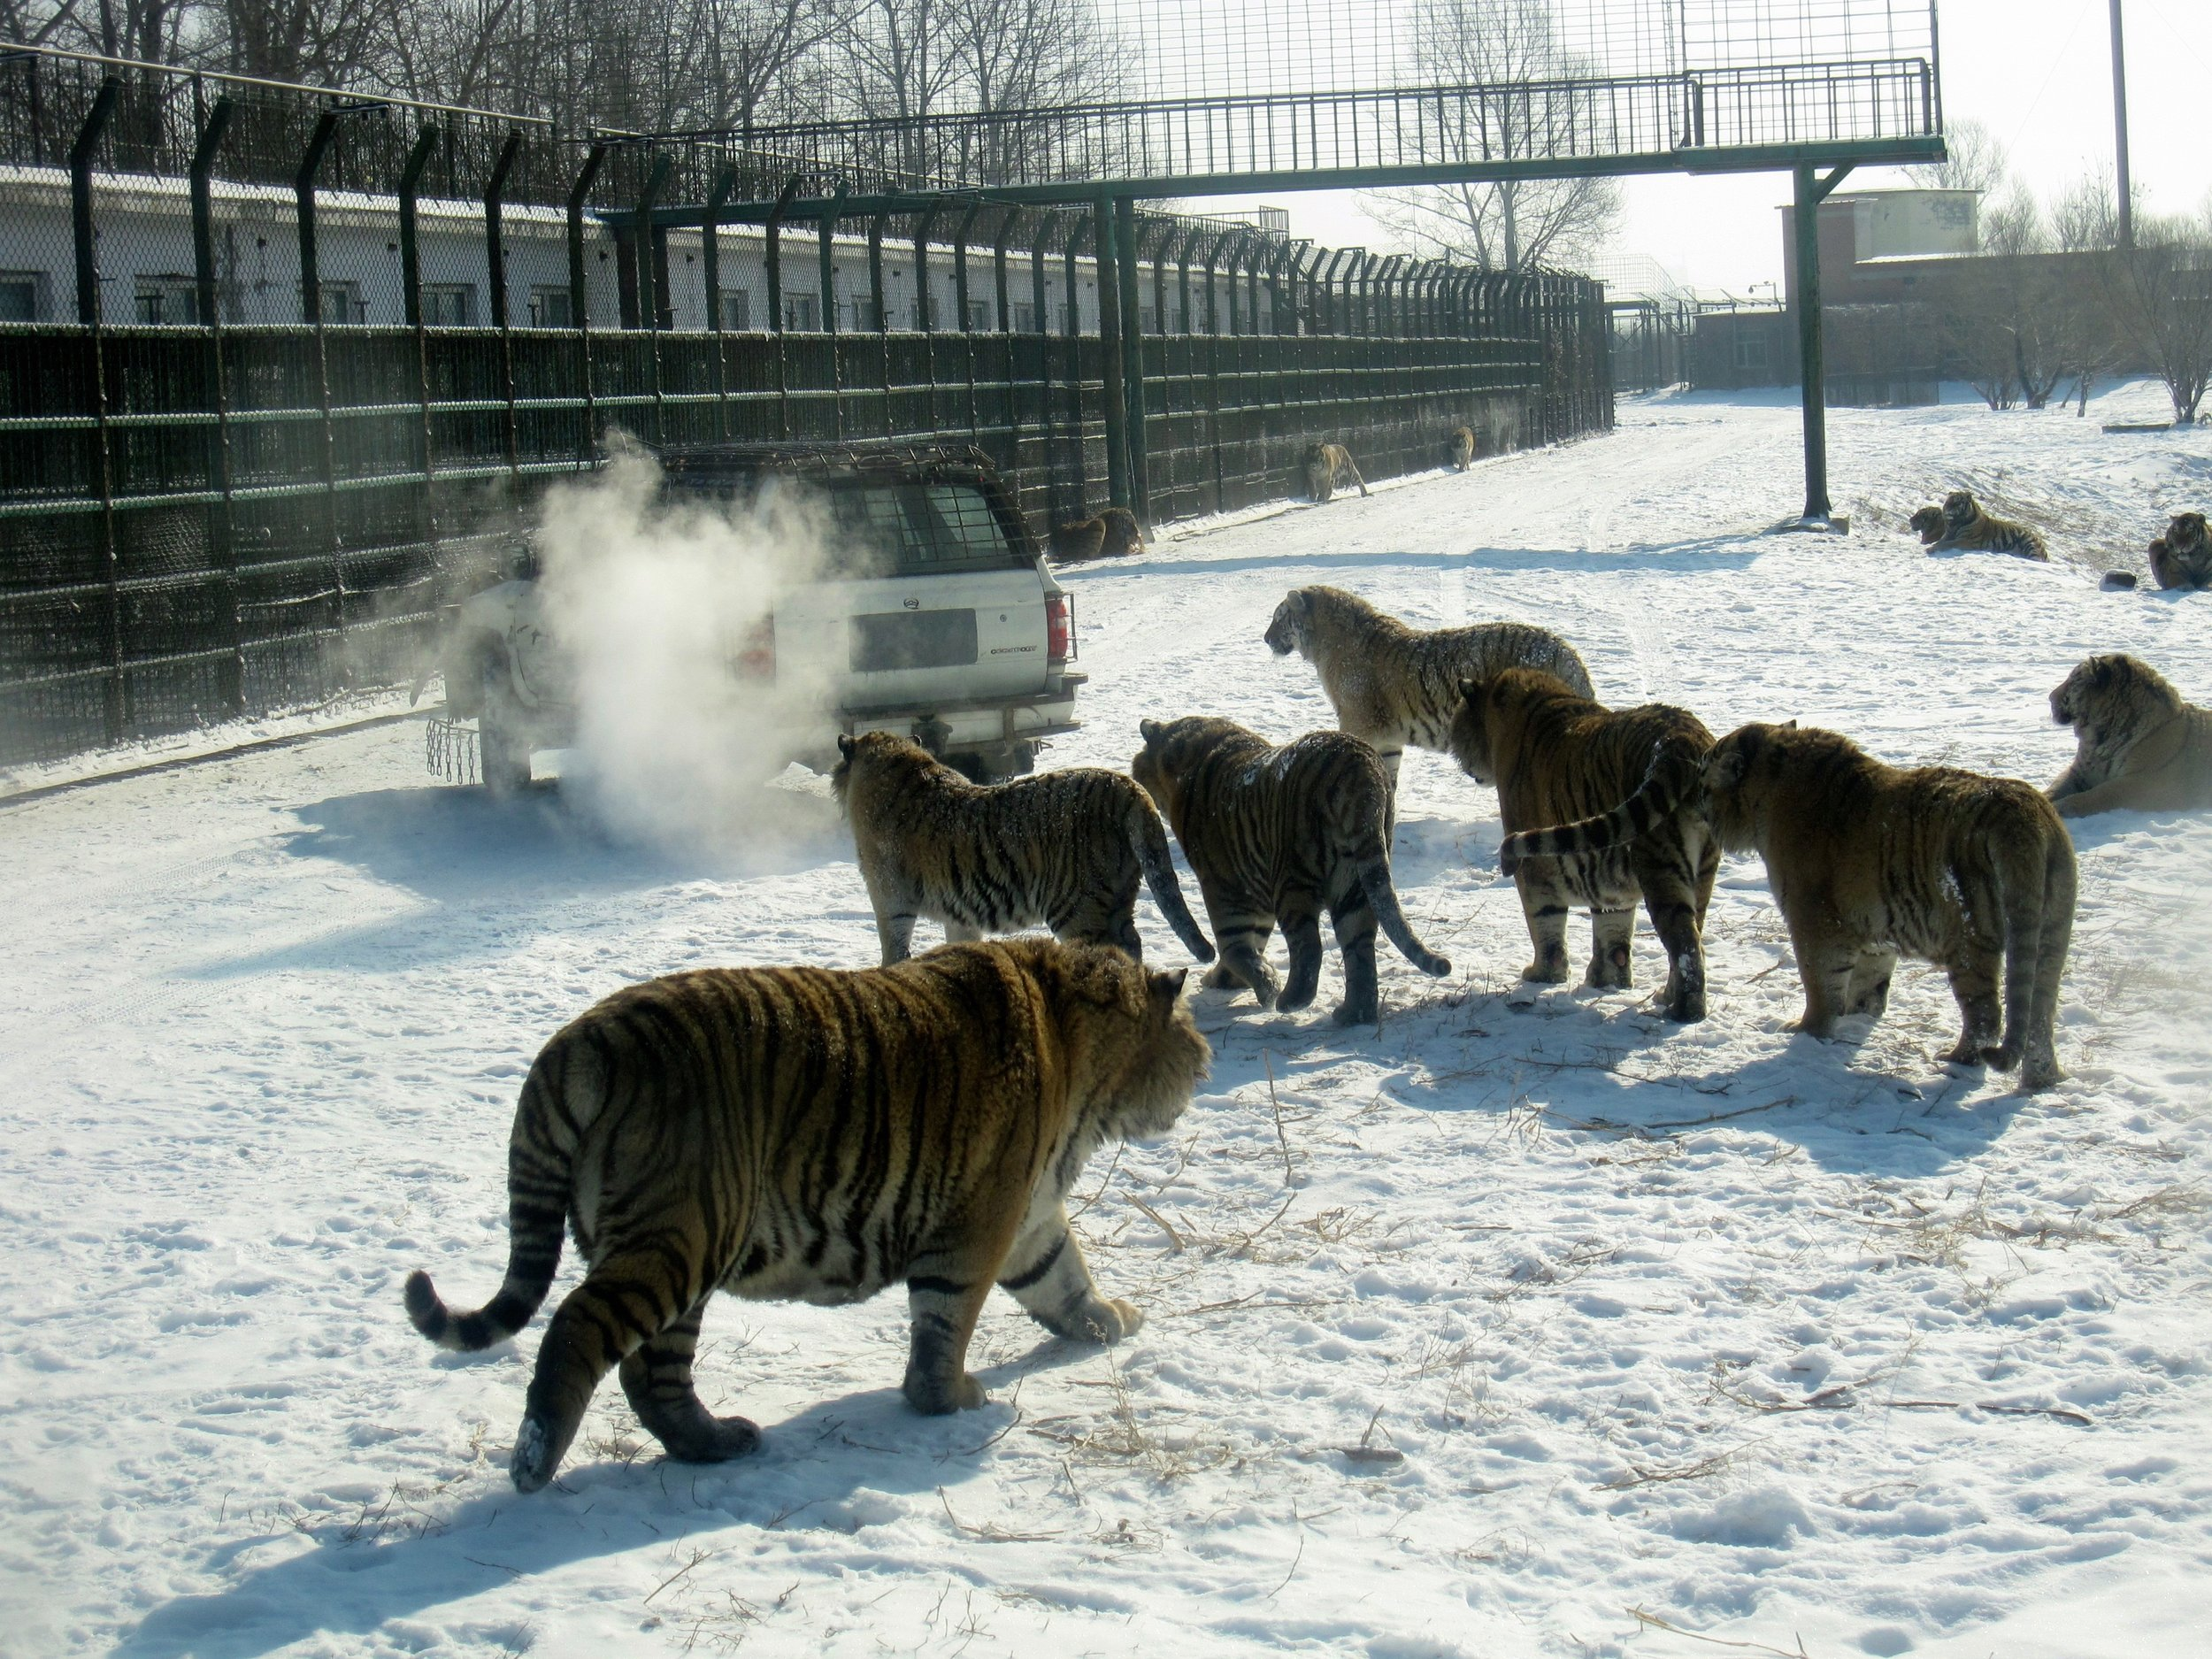 Hungry tigers at Harbin's Siberian Tiger park